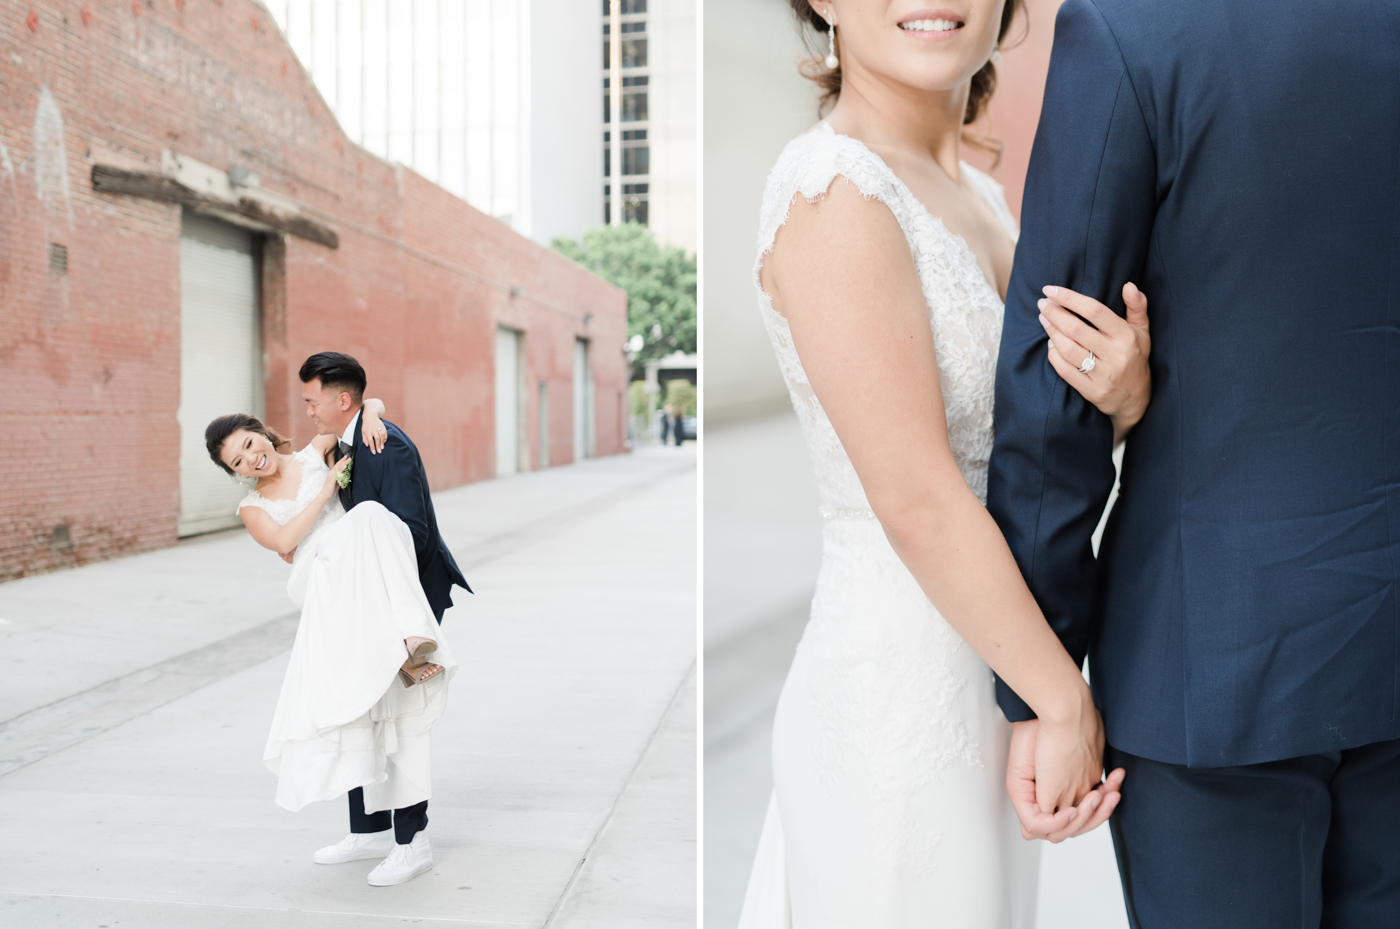 Modern_Wedding_HNYPT_Honeypot_LA_Photographer_Los_Angeles-39.jpg